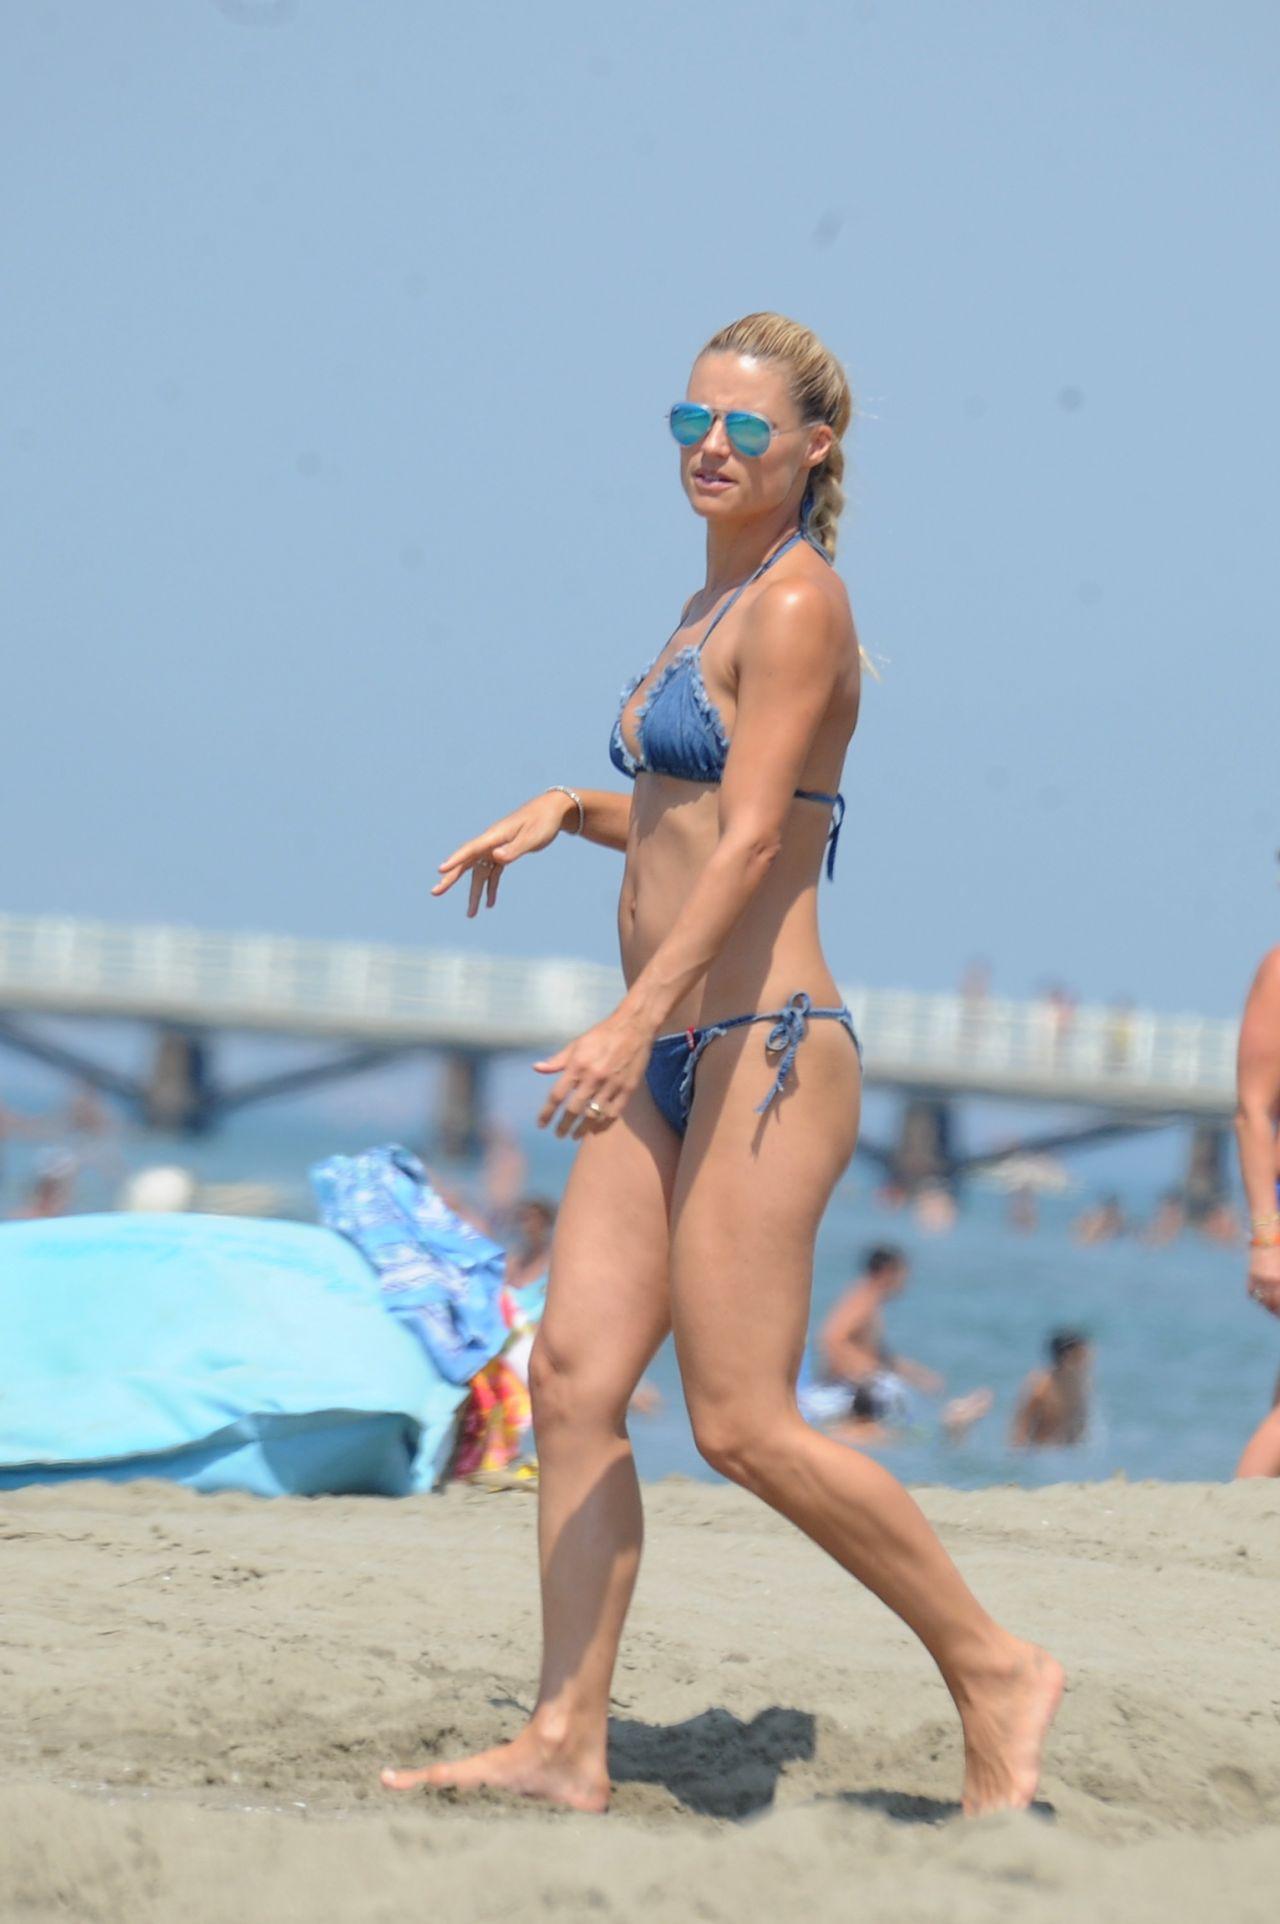 Michelle Hunziker Amp Daughter Aurora Bikini Candids At The Beach In Forte Dei Marmi July 2015